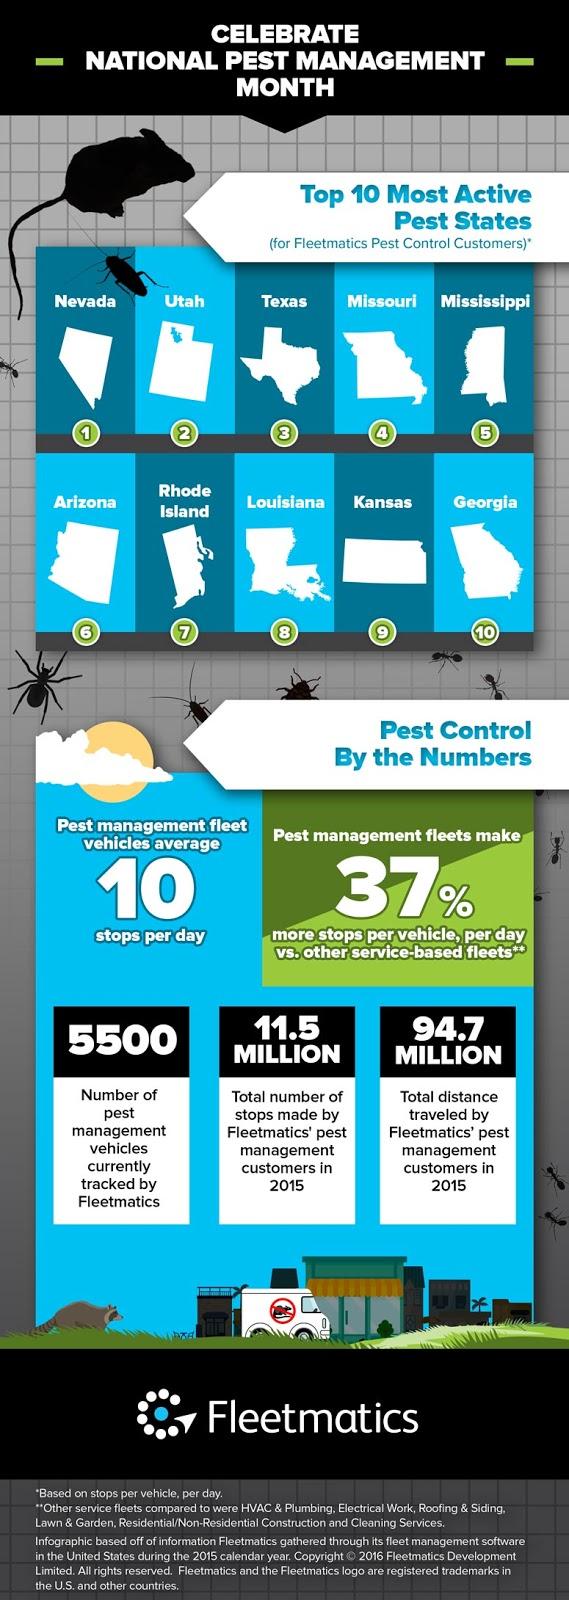 Pest Information Control